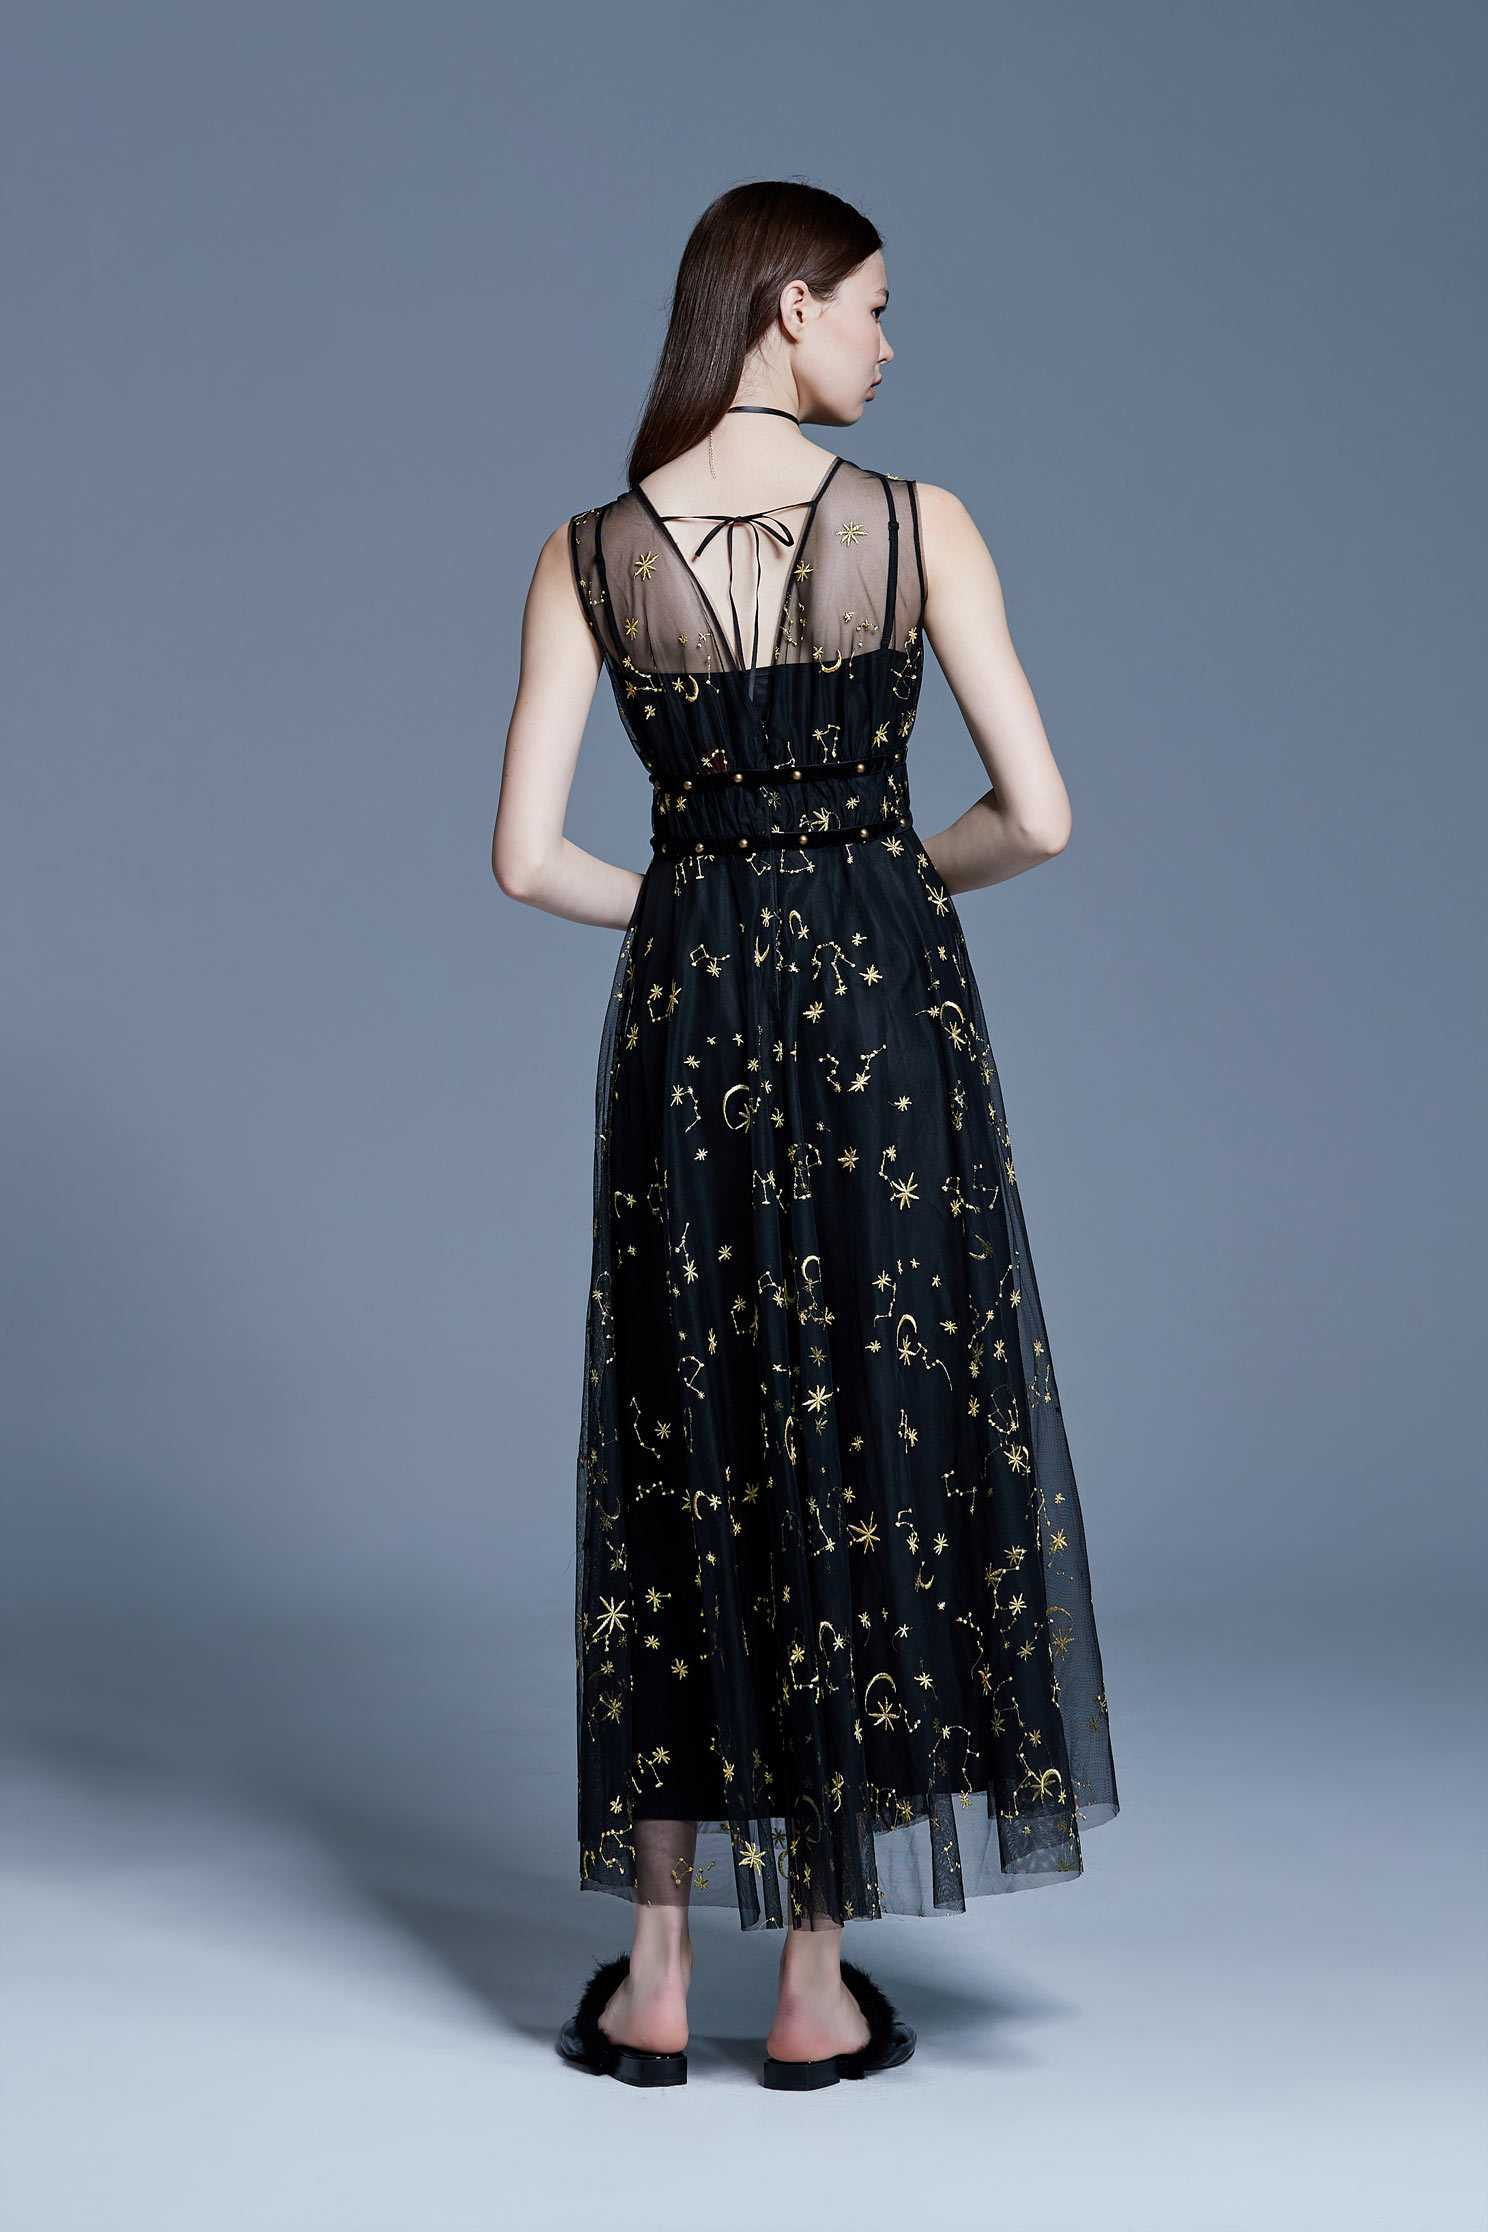 Gold line embroidered dress,V-neck dress,embroidery,刺繡洋裝,Cocktail Dress,無袖洋裝,Evening Wear,embroidered,Black dress